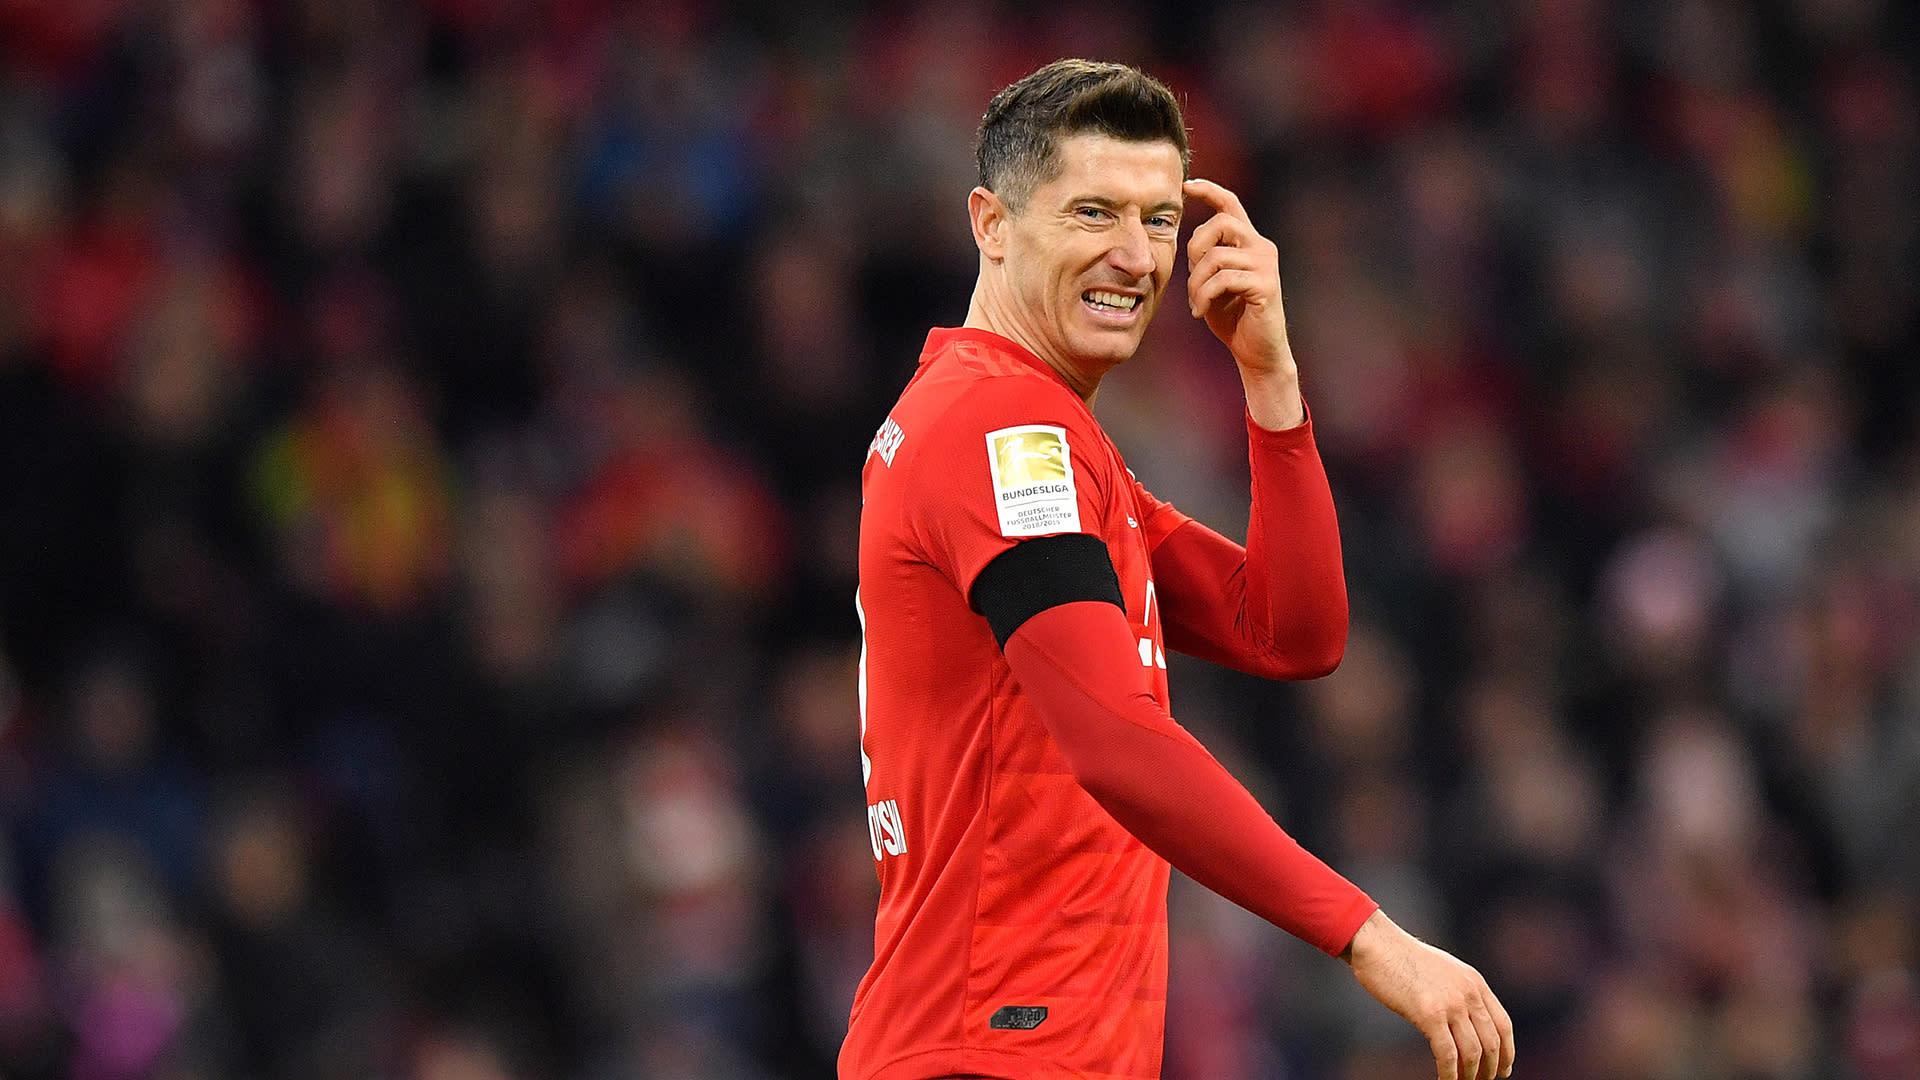 Lewandowski has put in the groundwork for Ballon d'Or win - Flick